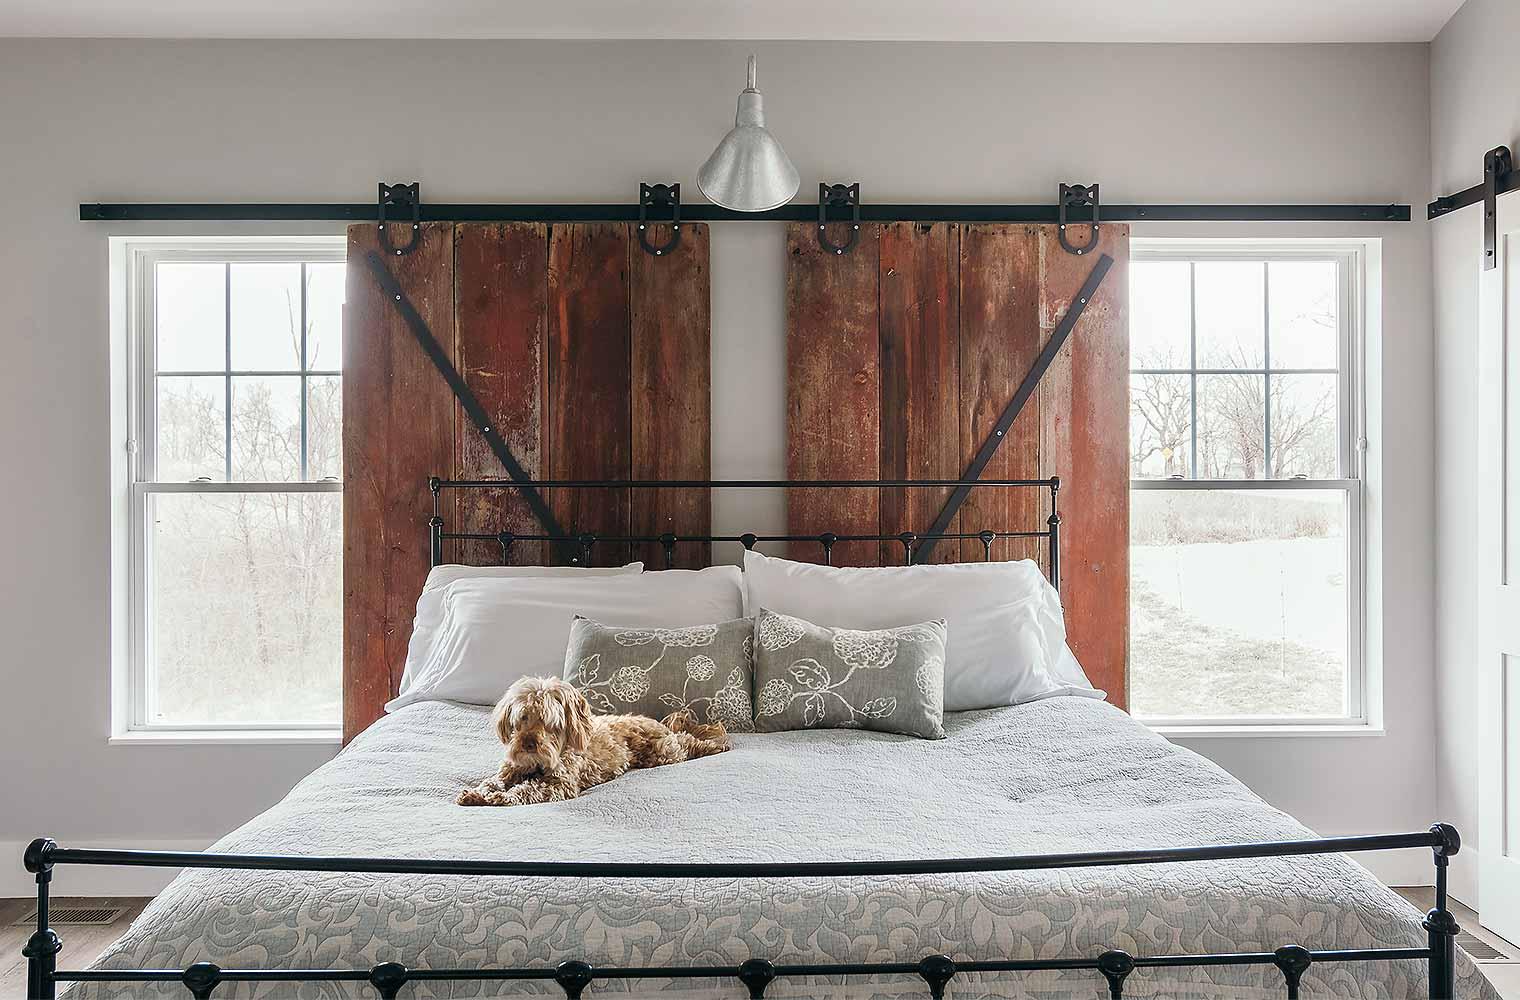 A Lifetime Love Of Barns Inspires A New Custom Home